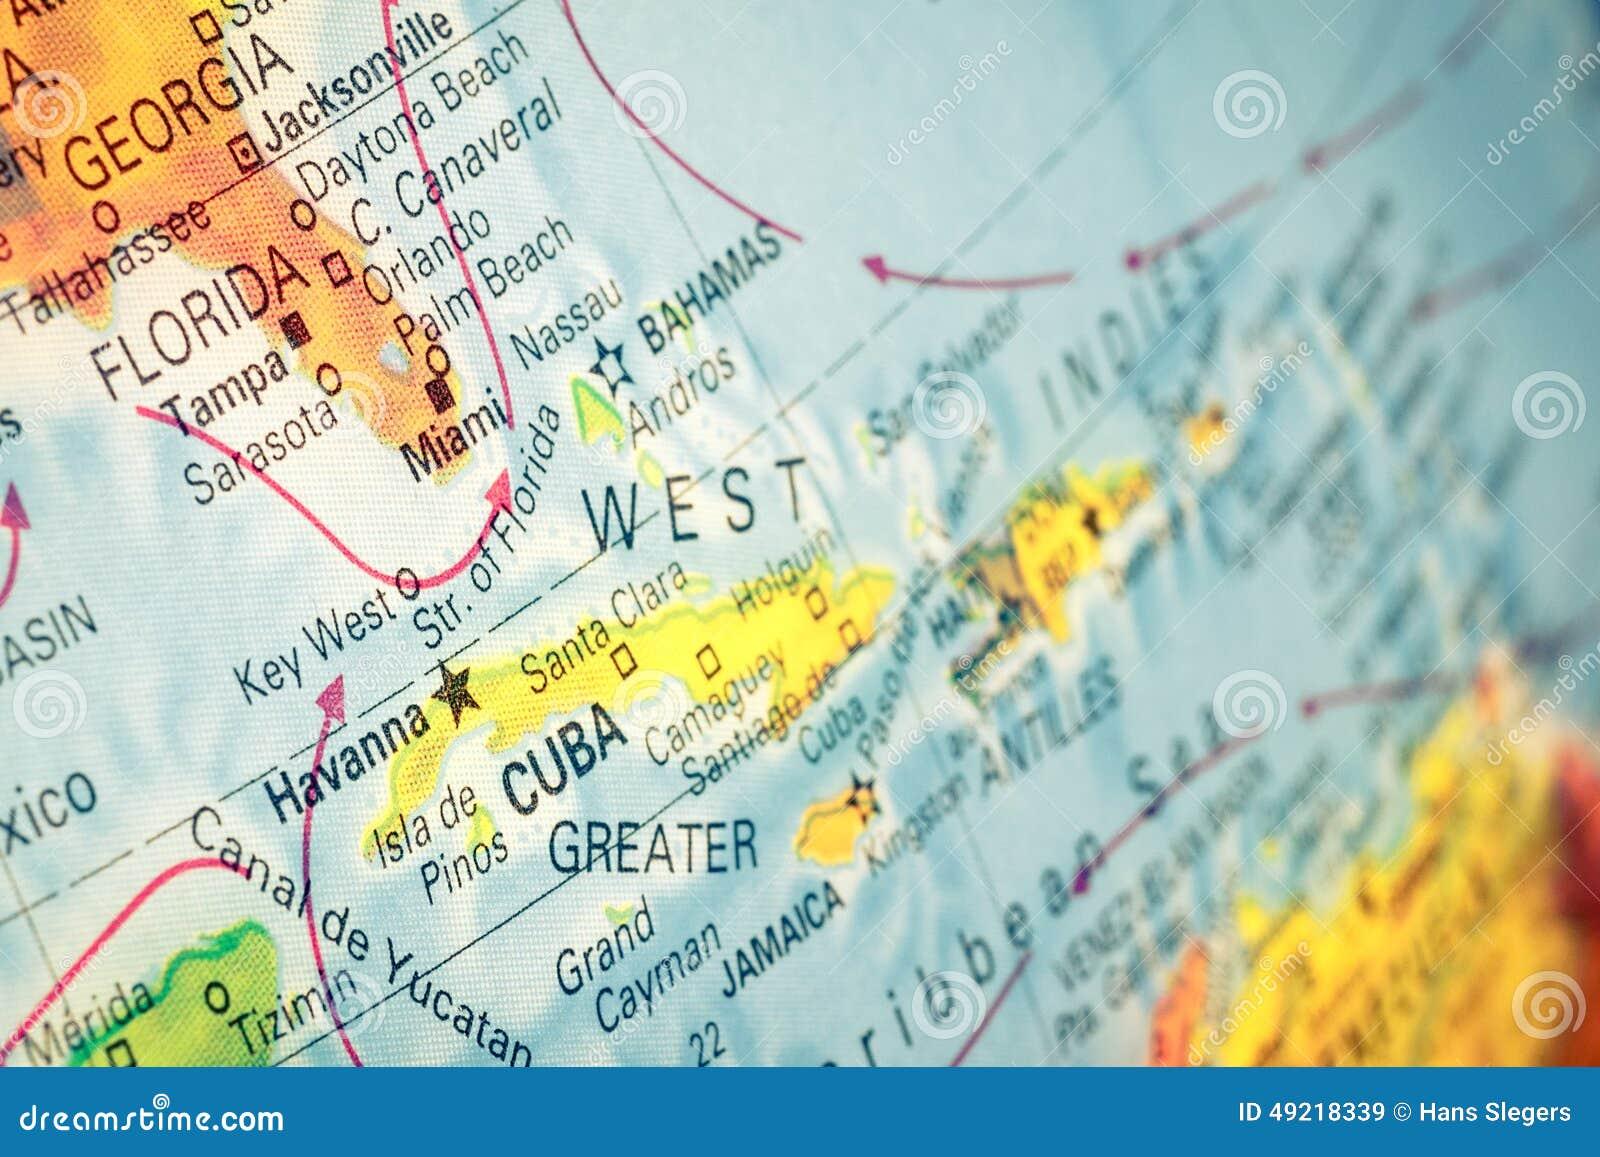 Cuba To Florida Map.Map Of Cuba And Florida Macro Image Stock Image Image Of